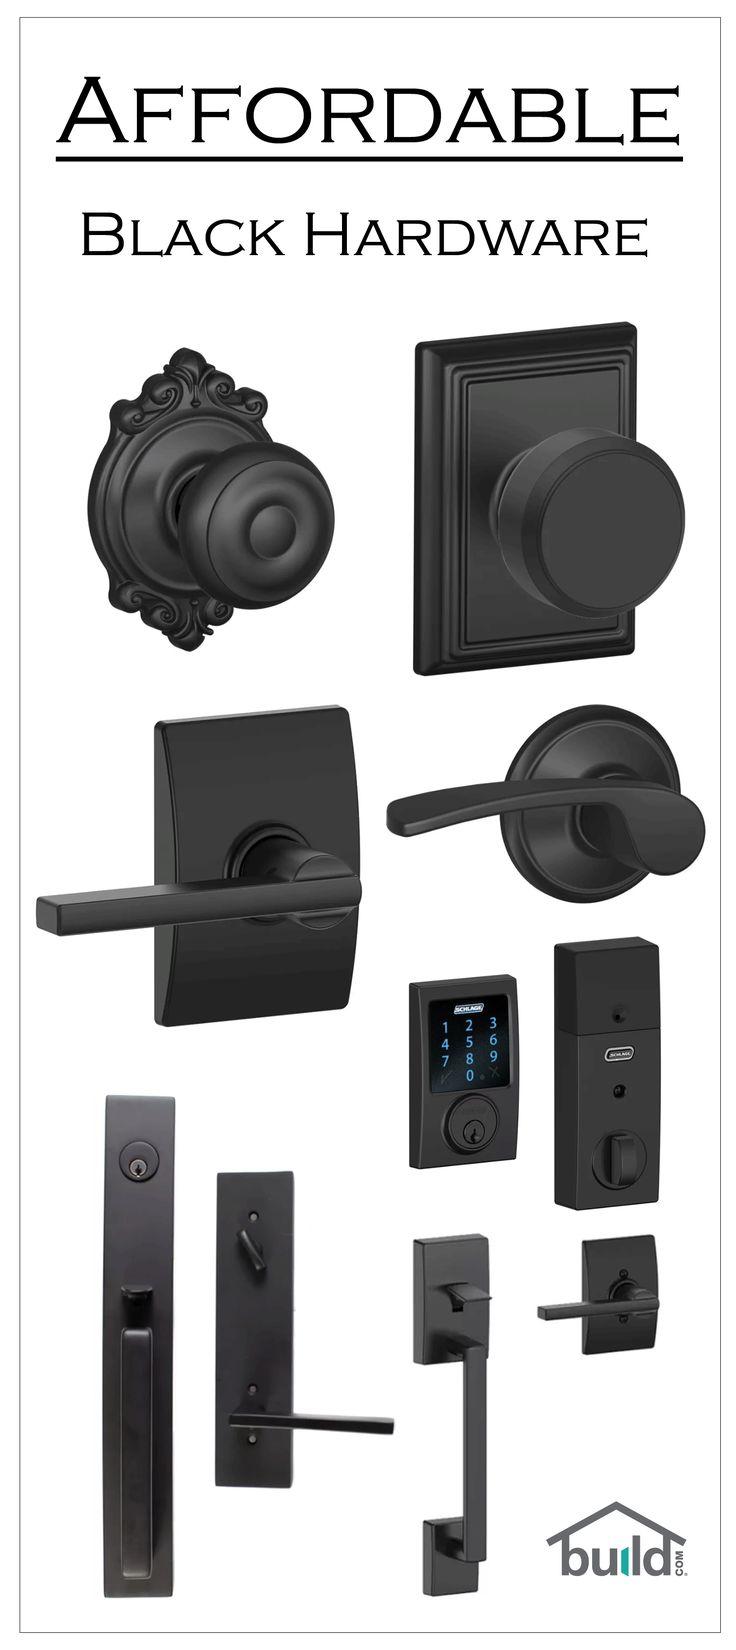 Black door hardware is a simple way to clean up the look